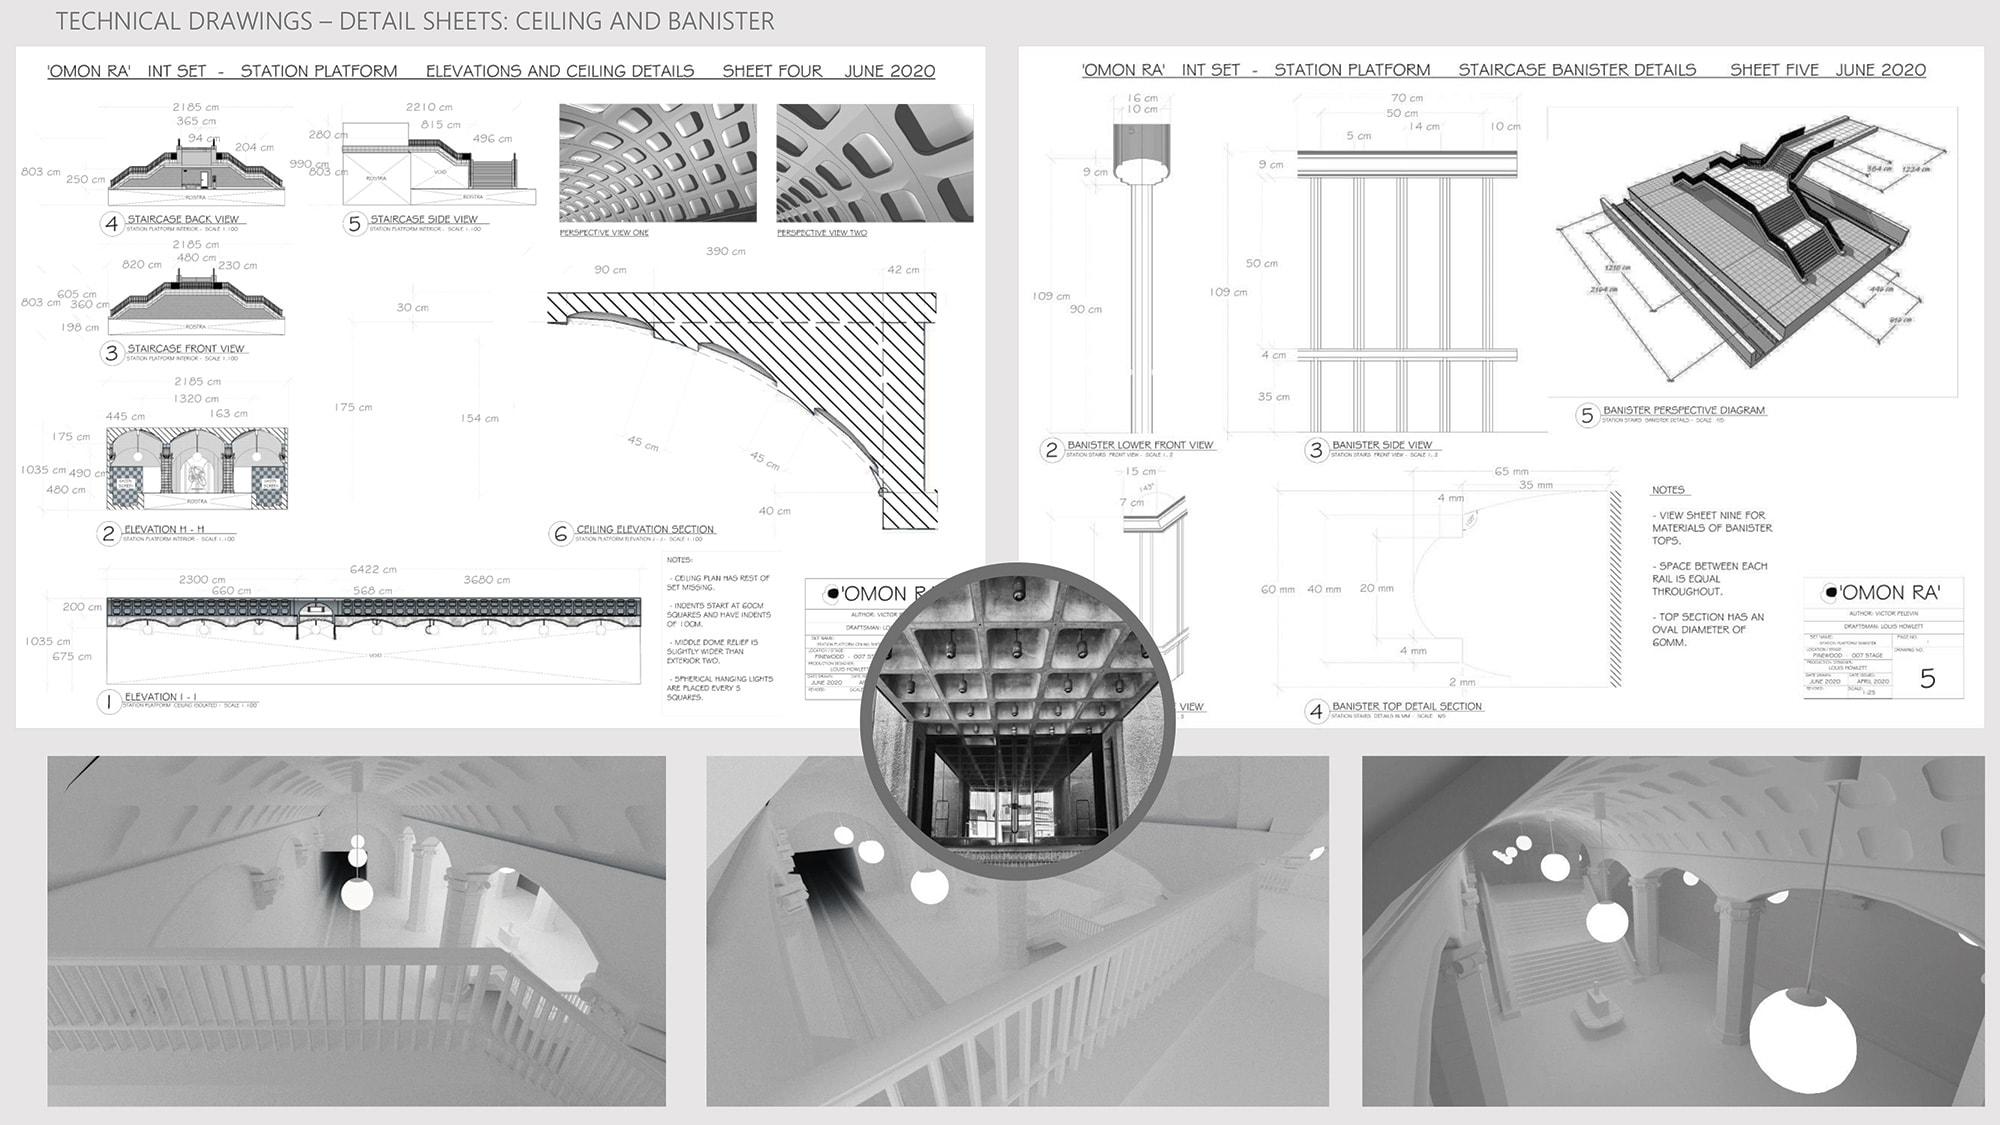 ba-production-arts-for-screen-Louis-Howlett-technical-drawings.jpg